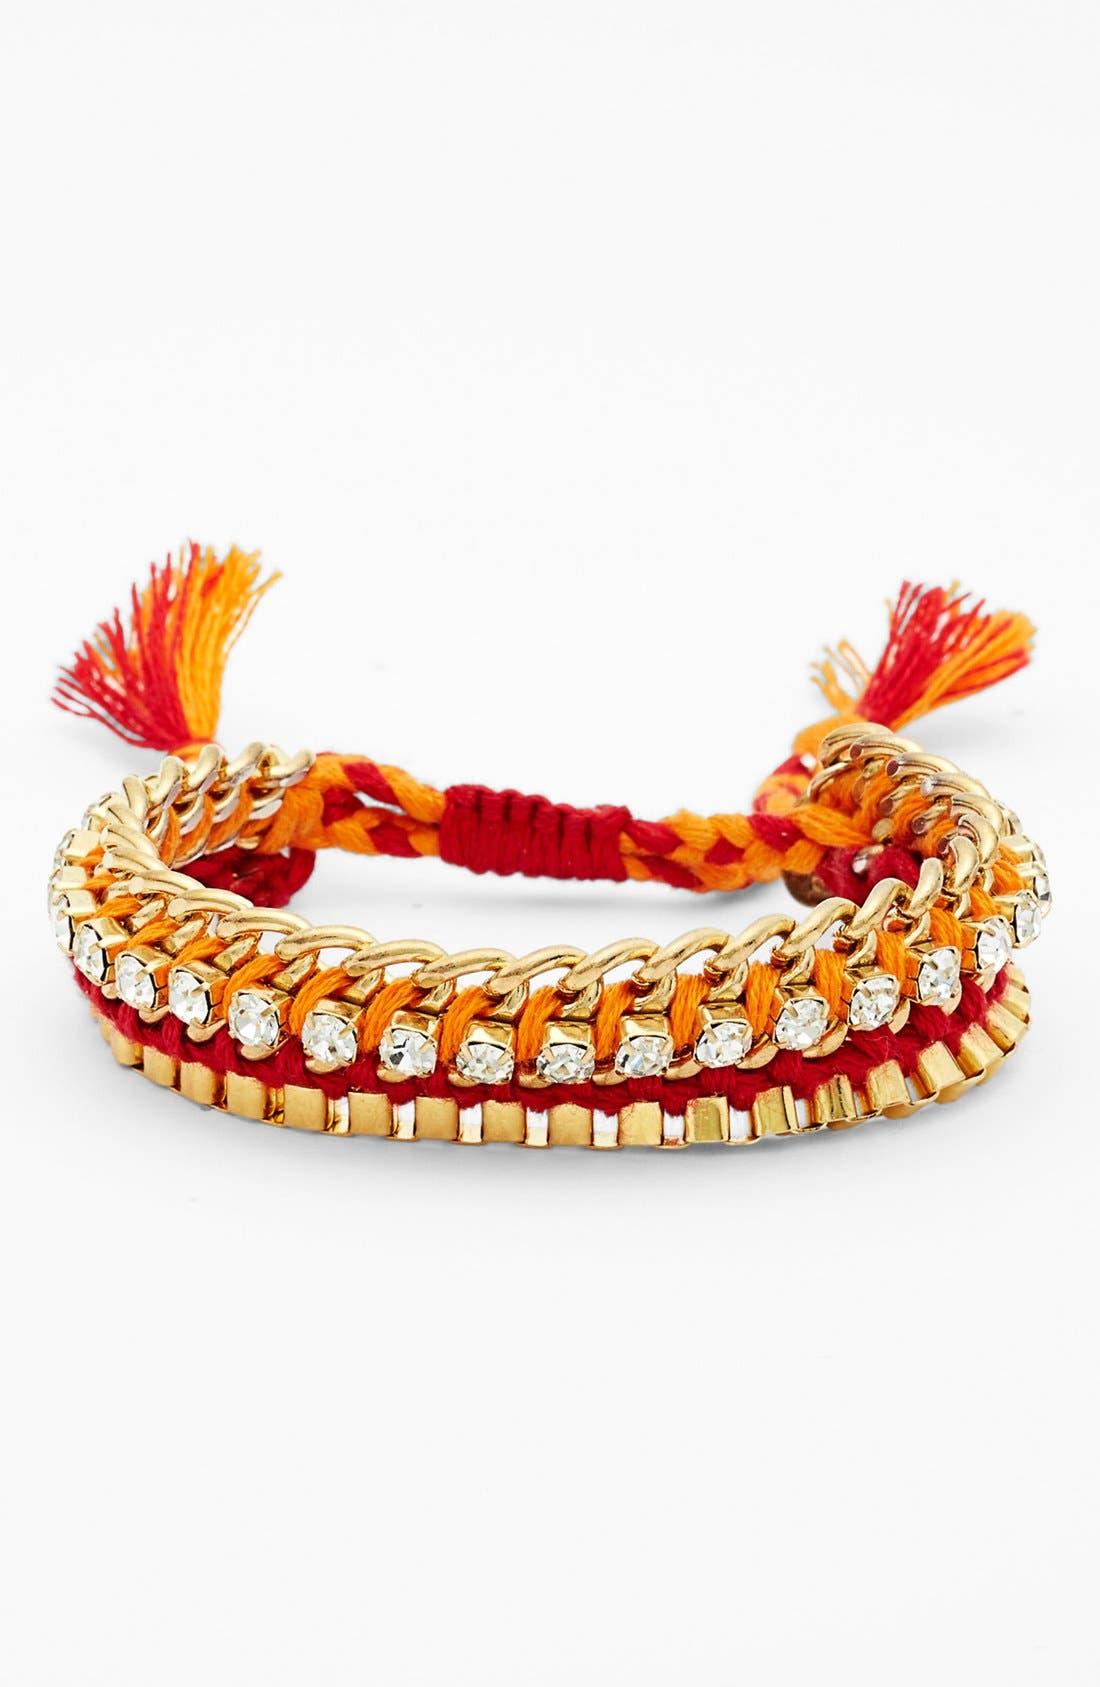 Main Image - Cara Crystal & Chain Friendship Bracelet